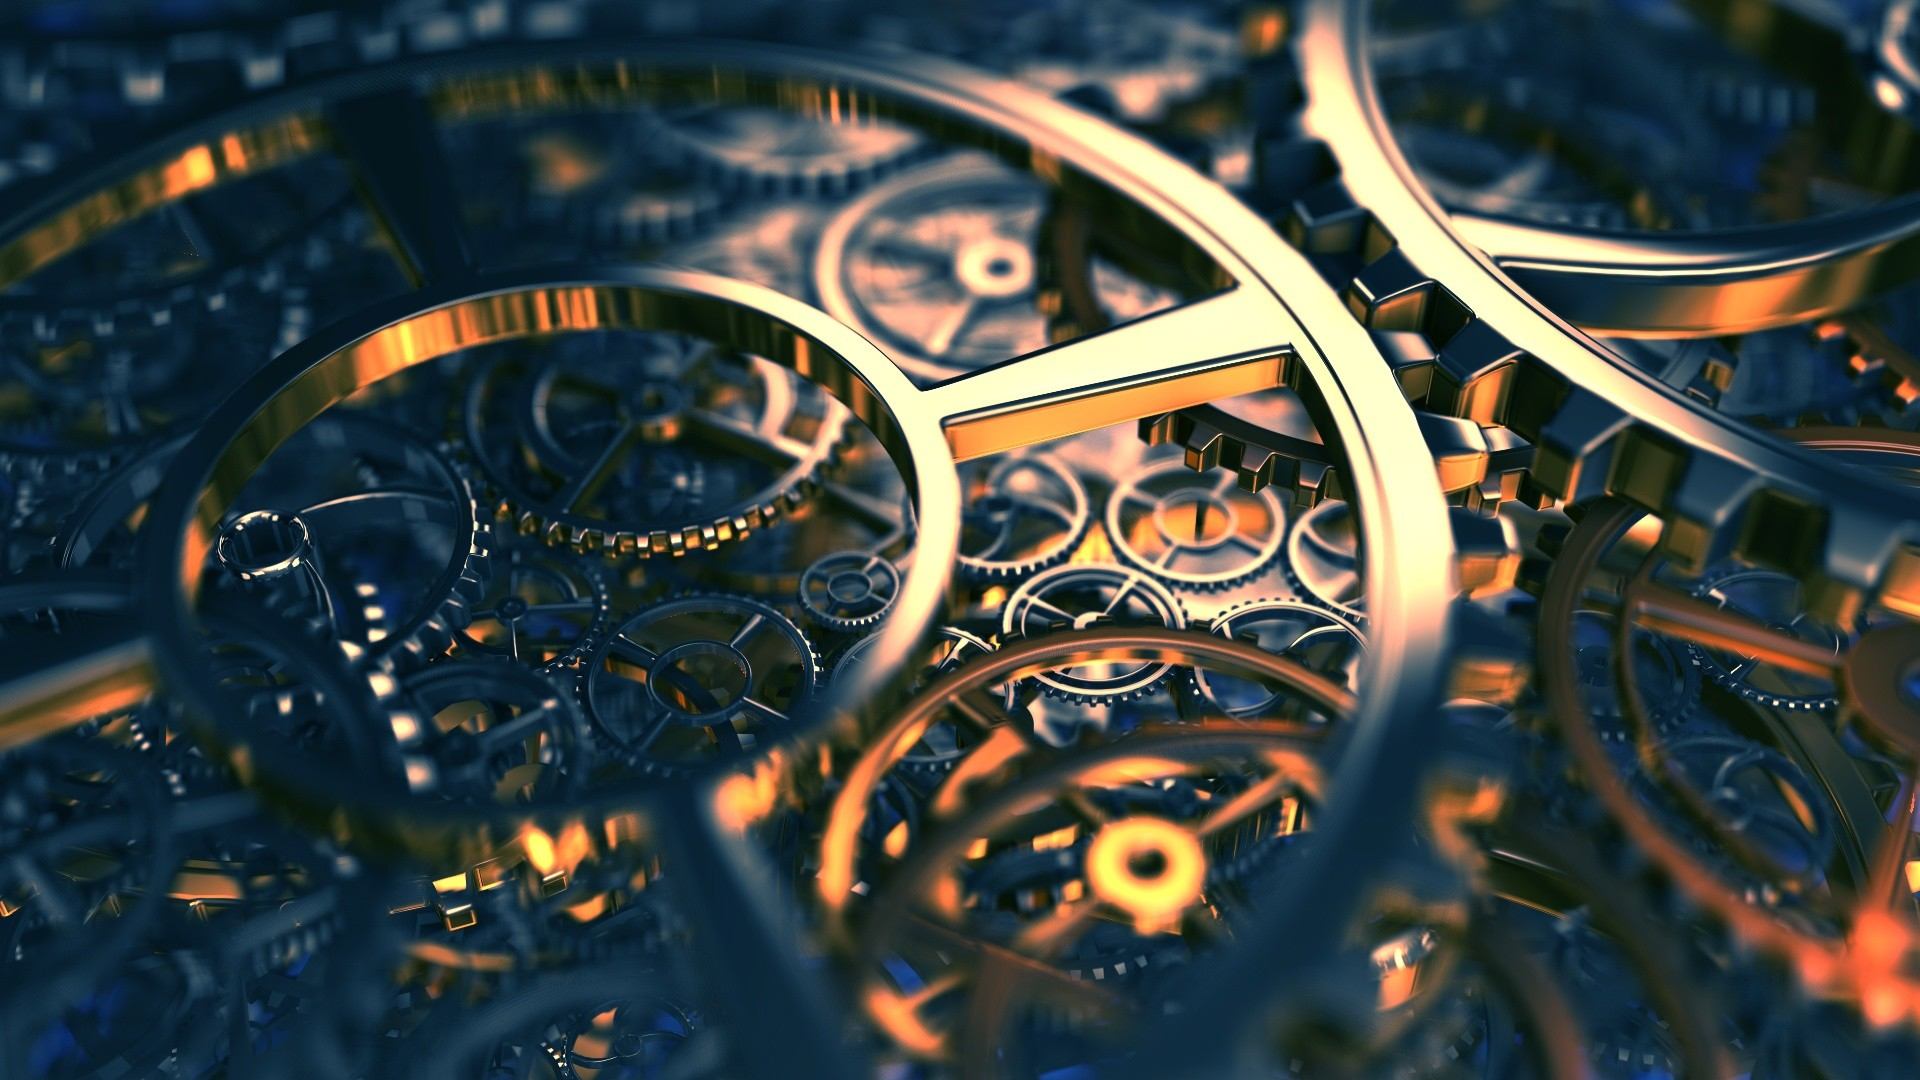 Popular Wallpaper Music Steampunk - 472318-best-steampunk-wallpaper-hd-1920x1080  Gallery_439783.jpg